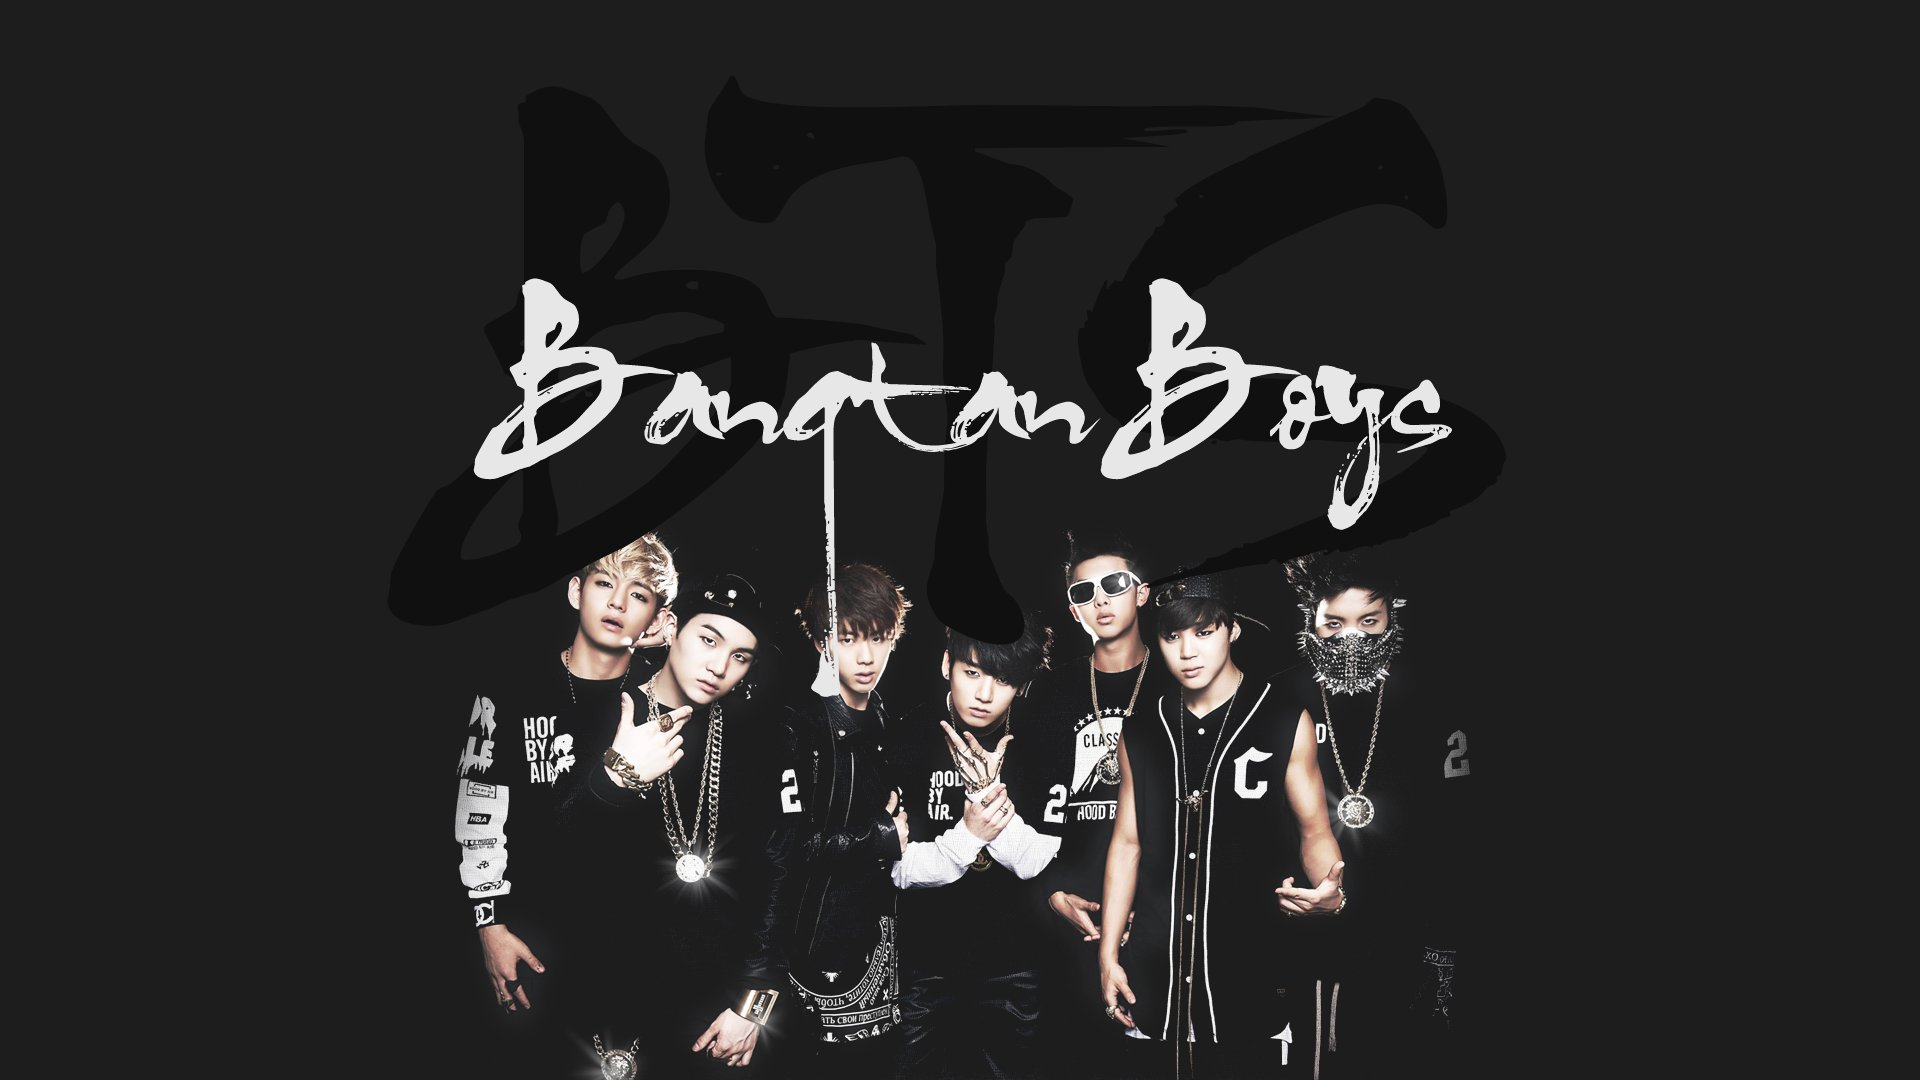 Bulletproof Boy Scouts bts kpop hip hop r b dance wallpaper background 1920x1080